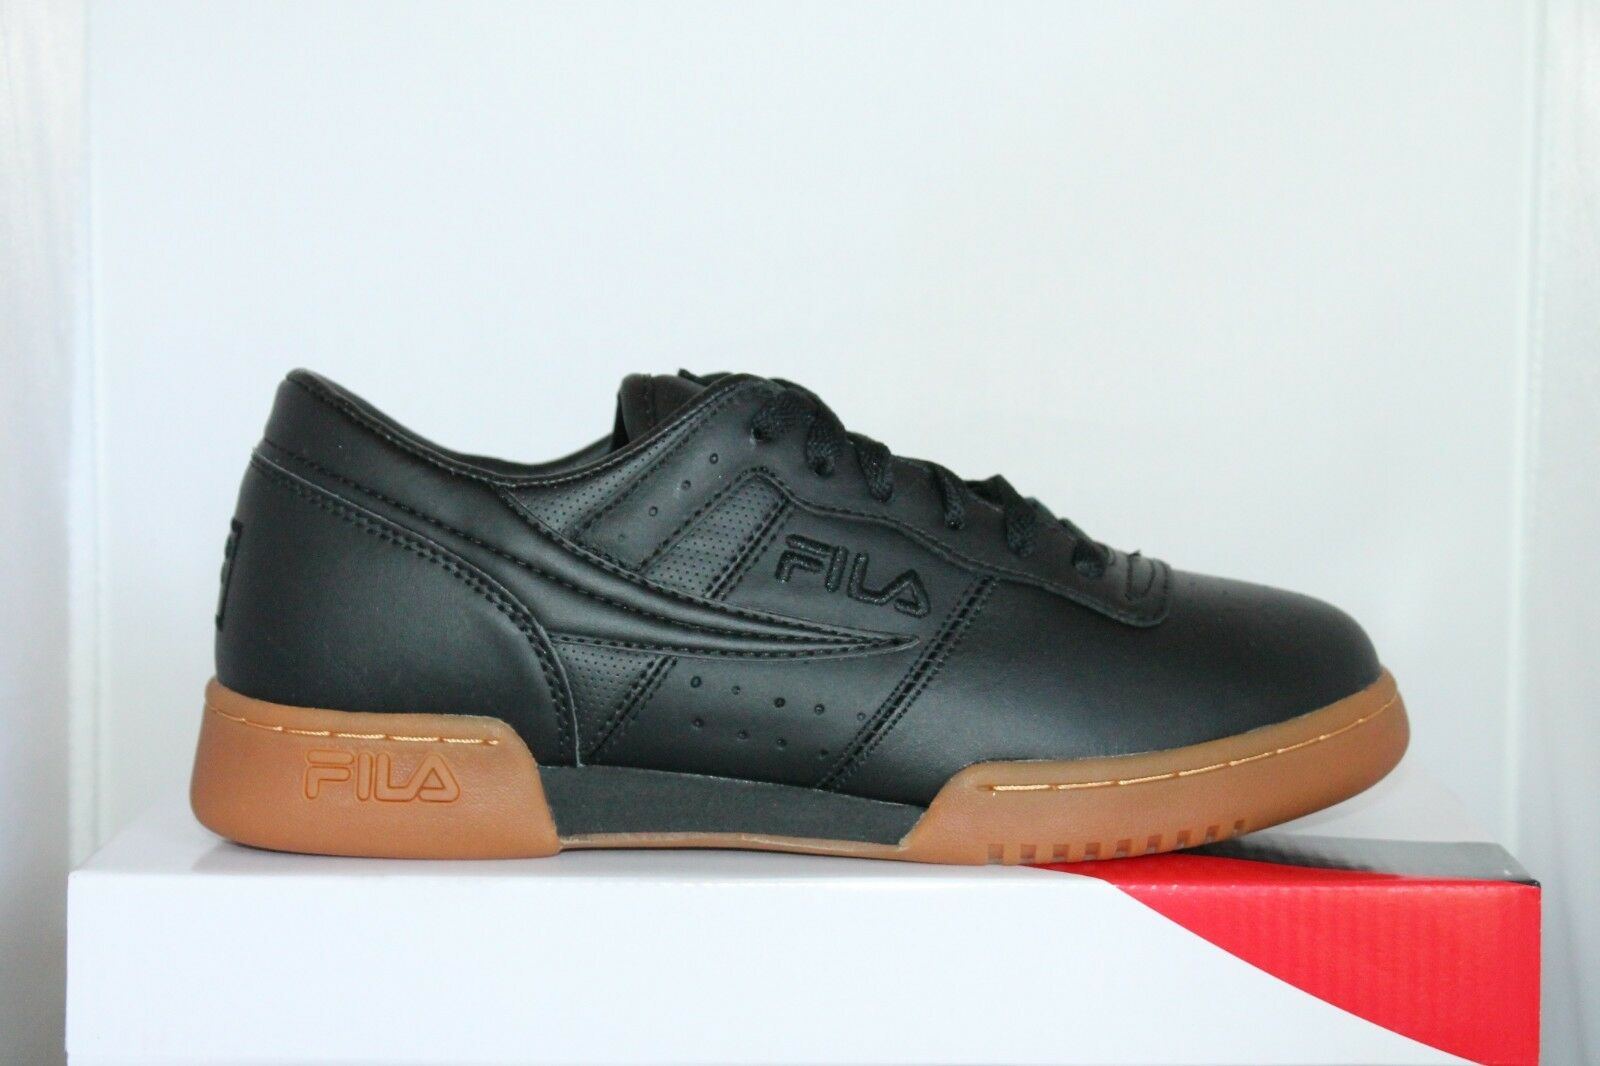 500ba9953b04 Buy Mens FILA Original Fitness Classic Retro Casual Athletic Shoes ...